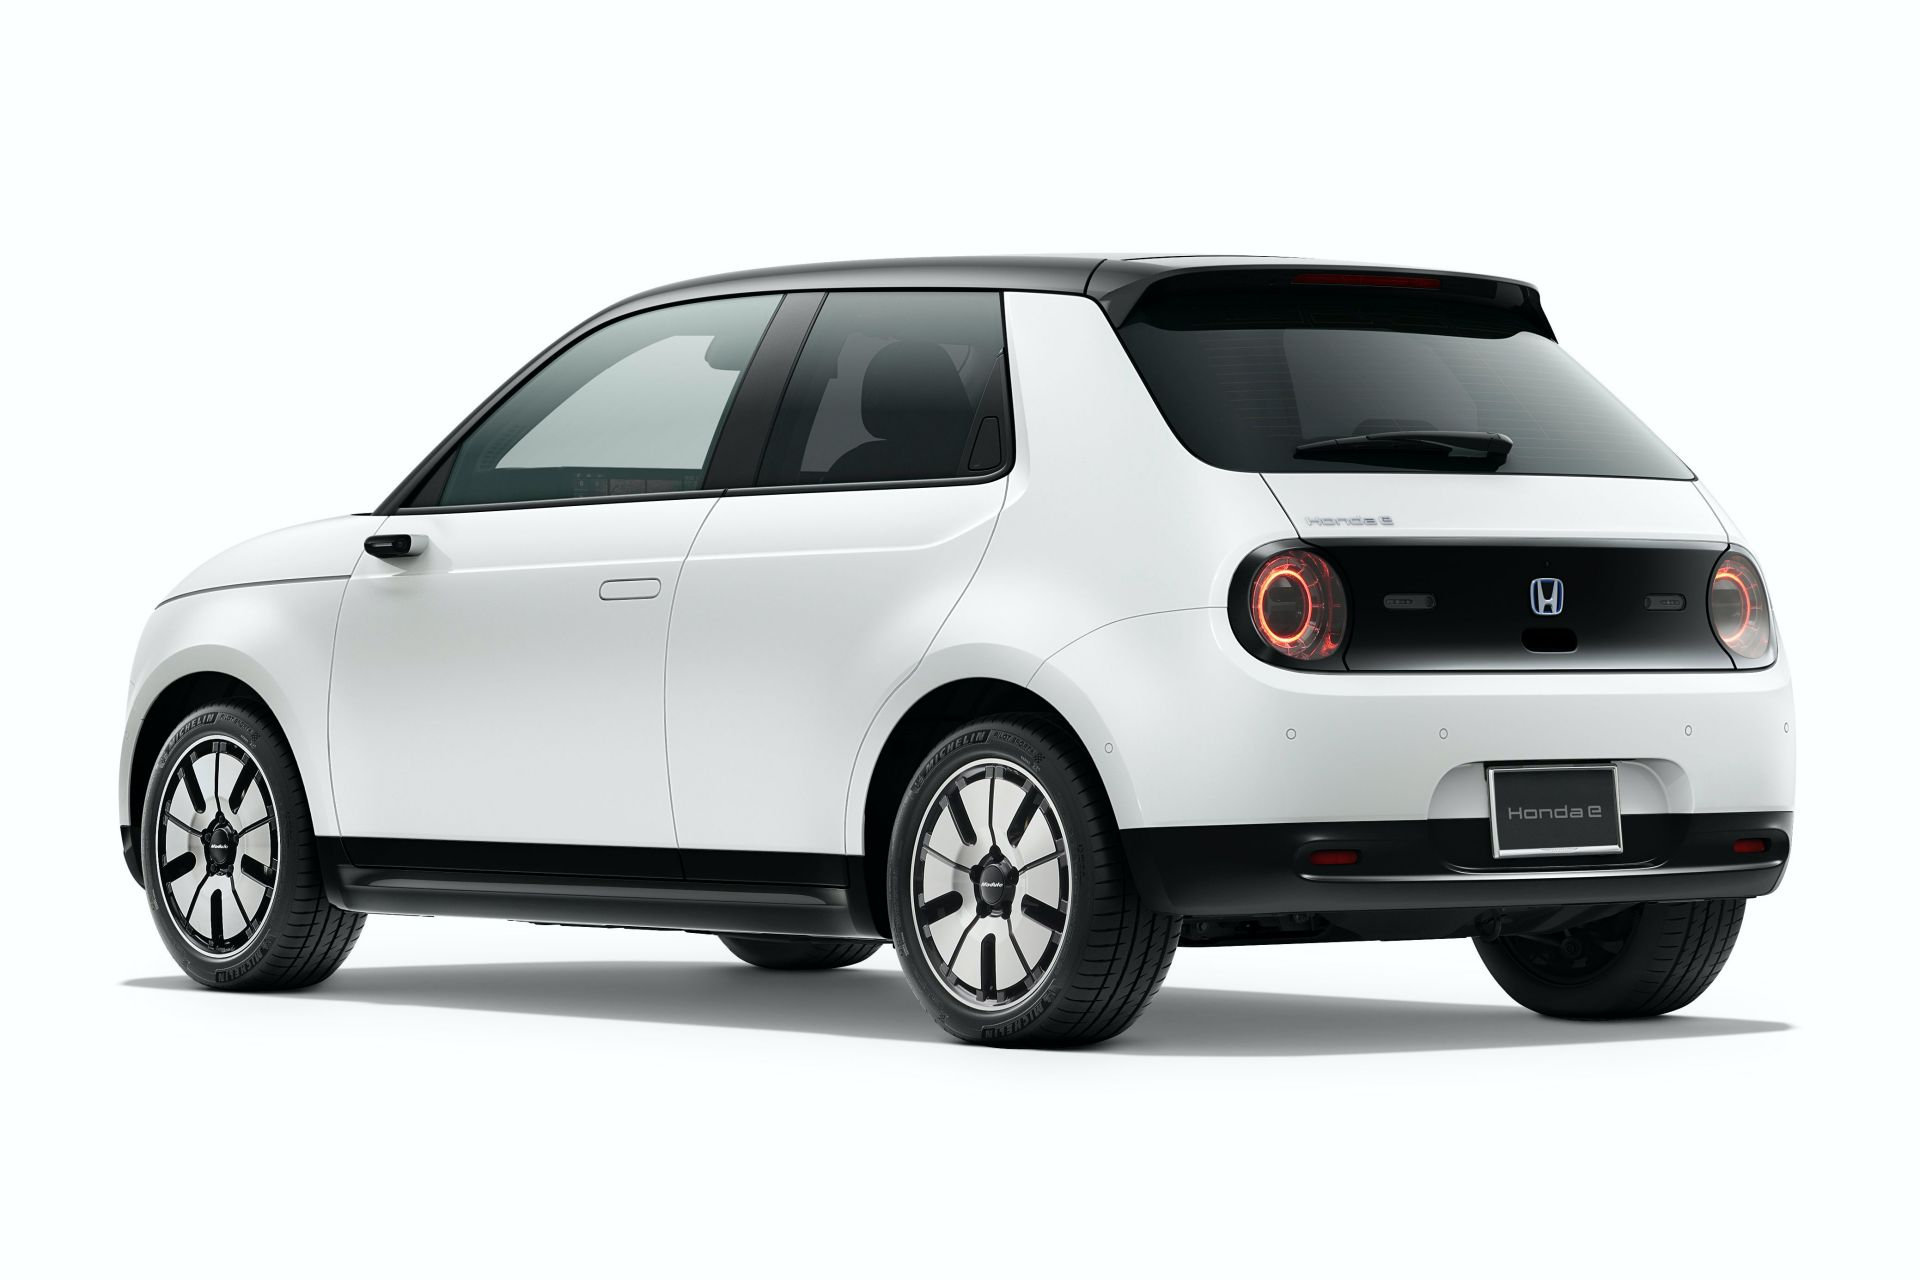 2021-Honda-e-genuine-accessories-JDM-spec-2